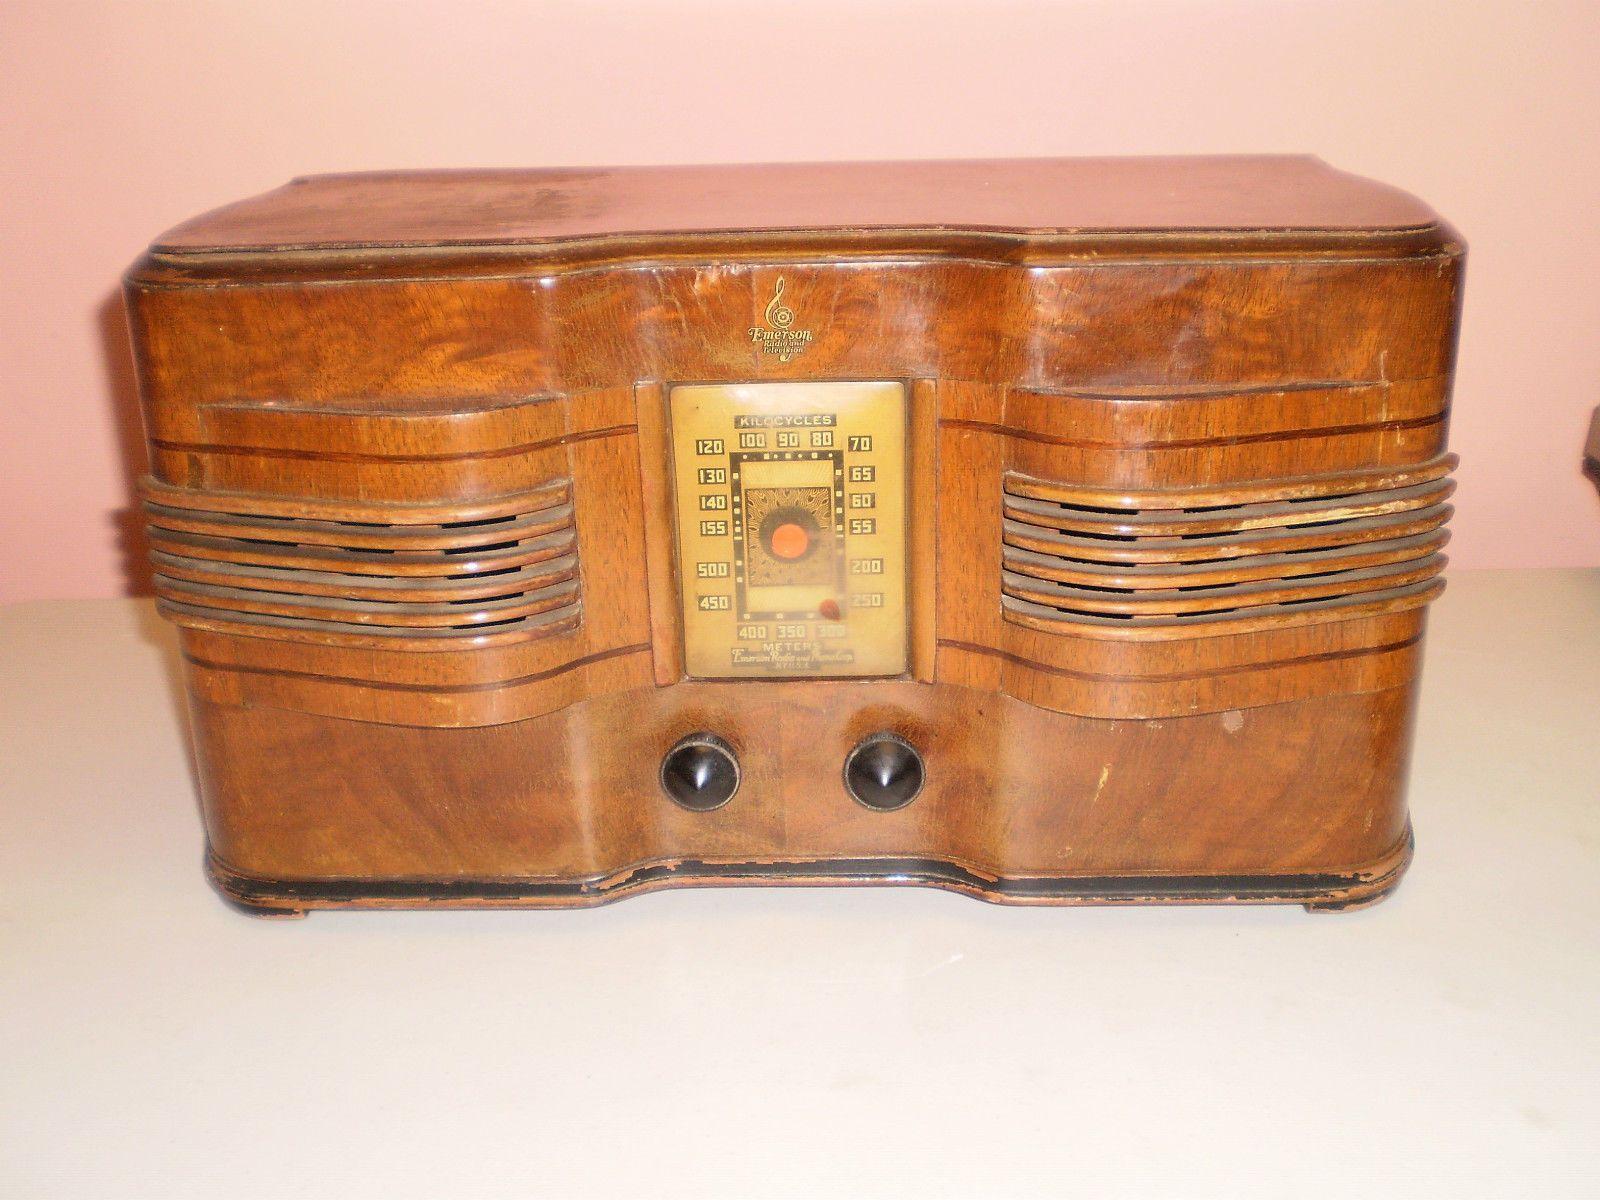 Emerson Wooden Radio For Restoration Or Parts Model 376 Ingraham Cabinet Vintage Radio Radio Old Radios